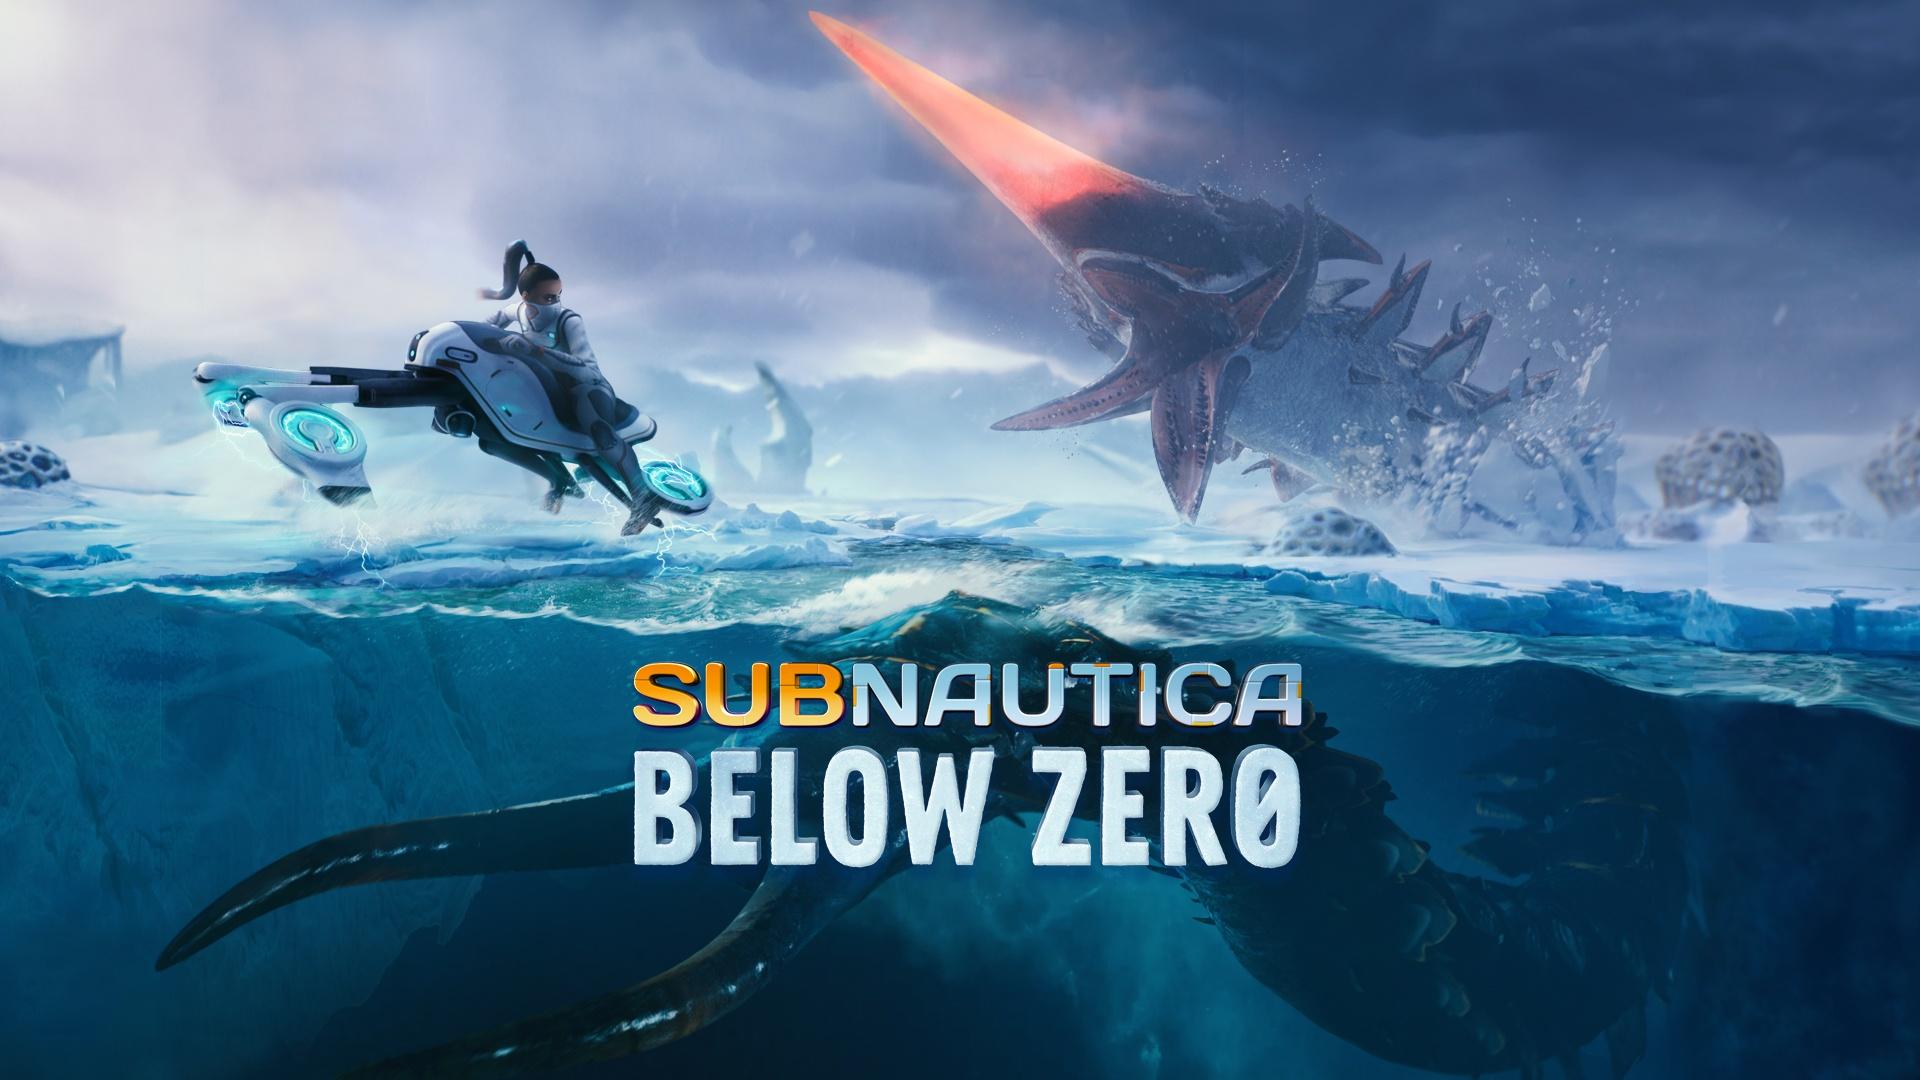 Subnautica Below Zero background picture